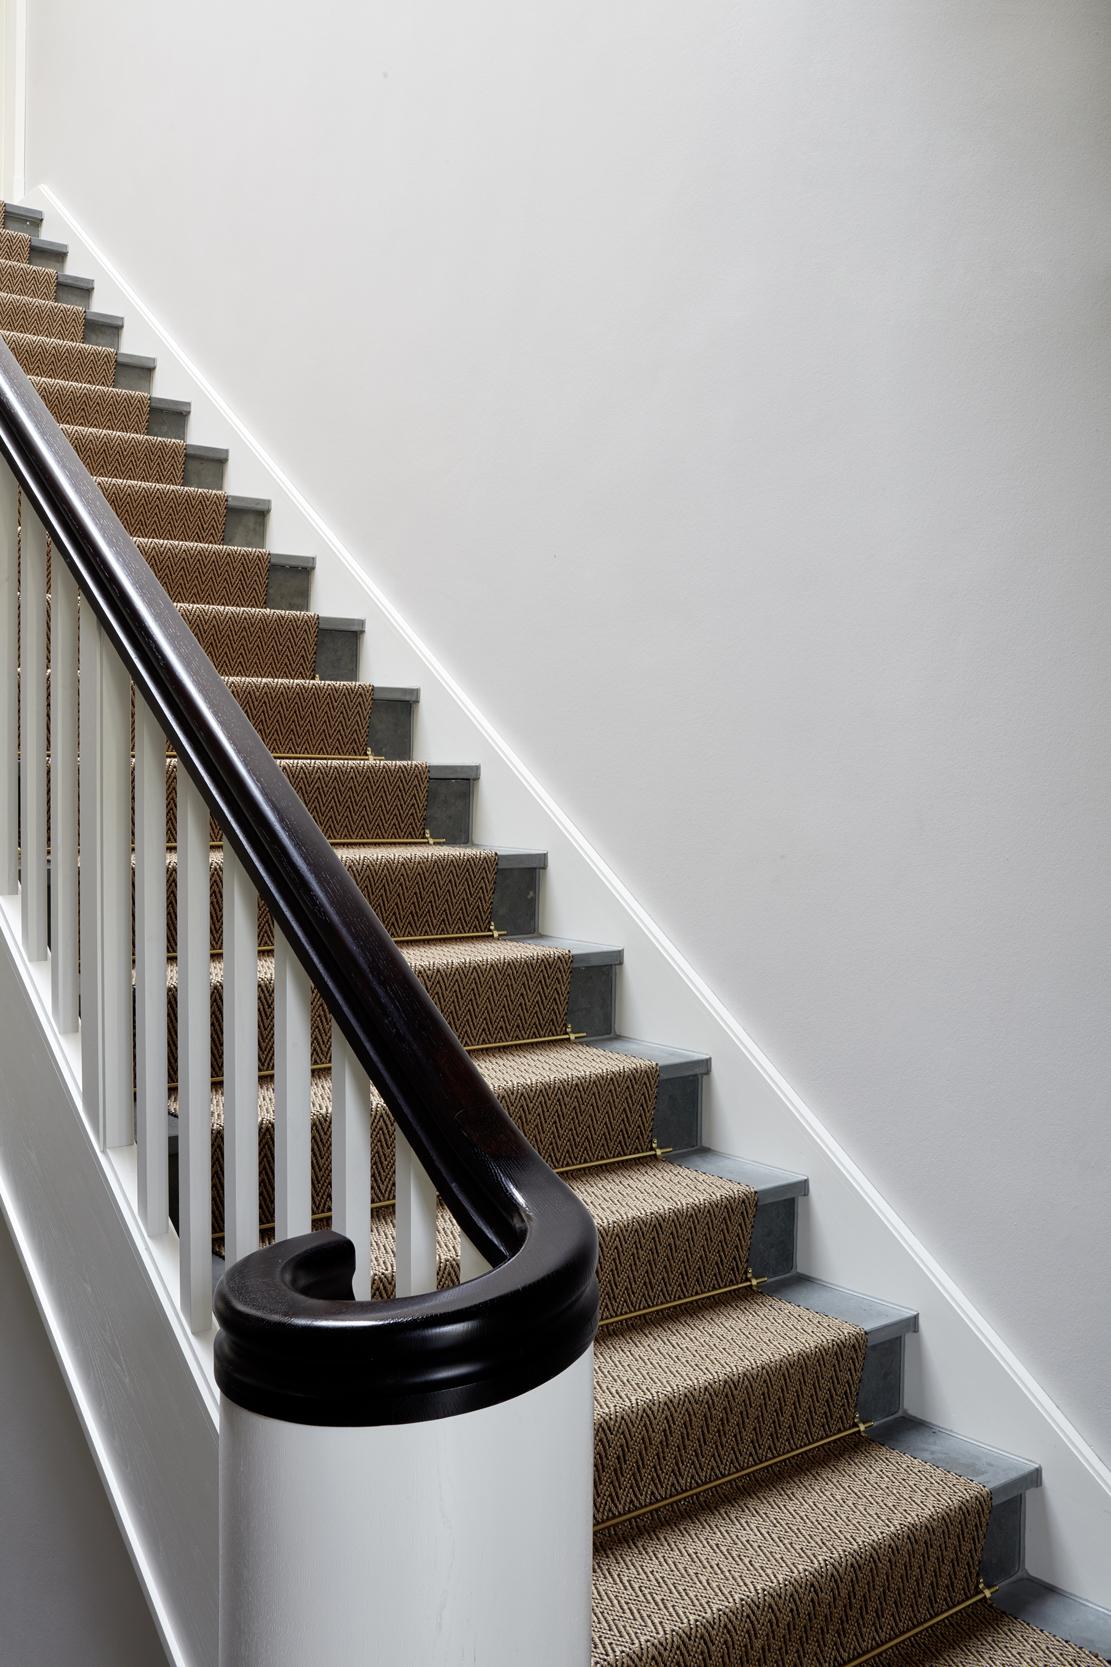 Runder Fußpunkt der Treppenanlage - Villa in klassisch traditionellem Stil